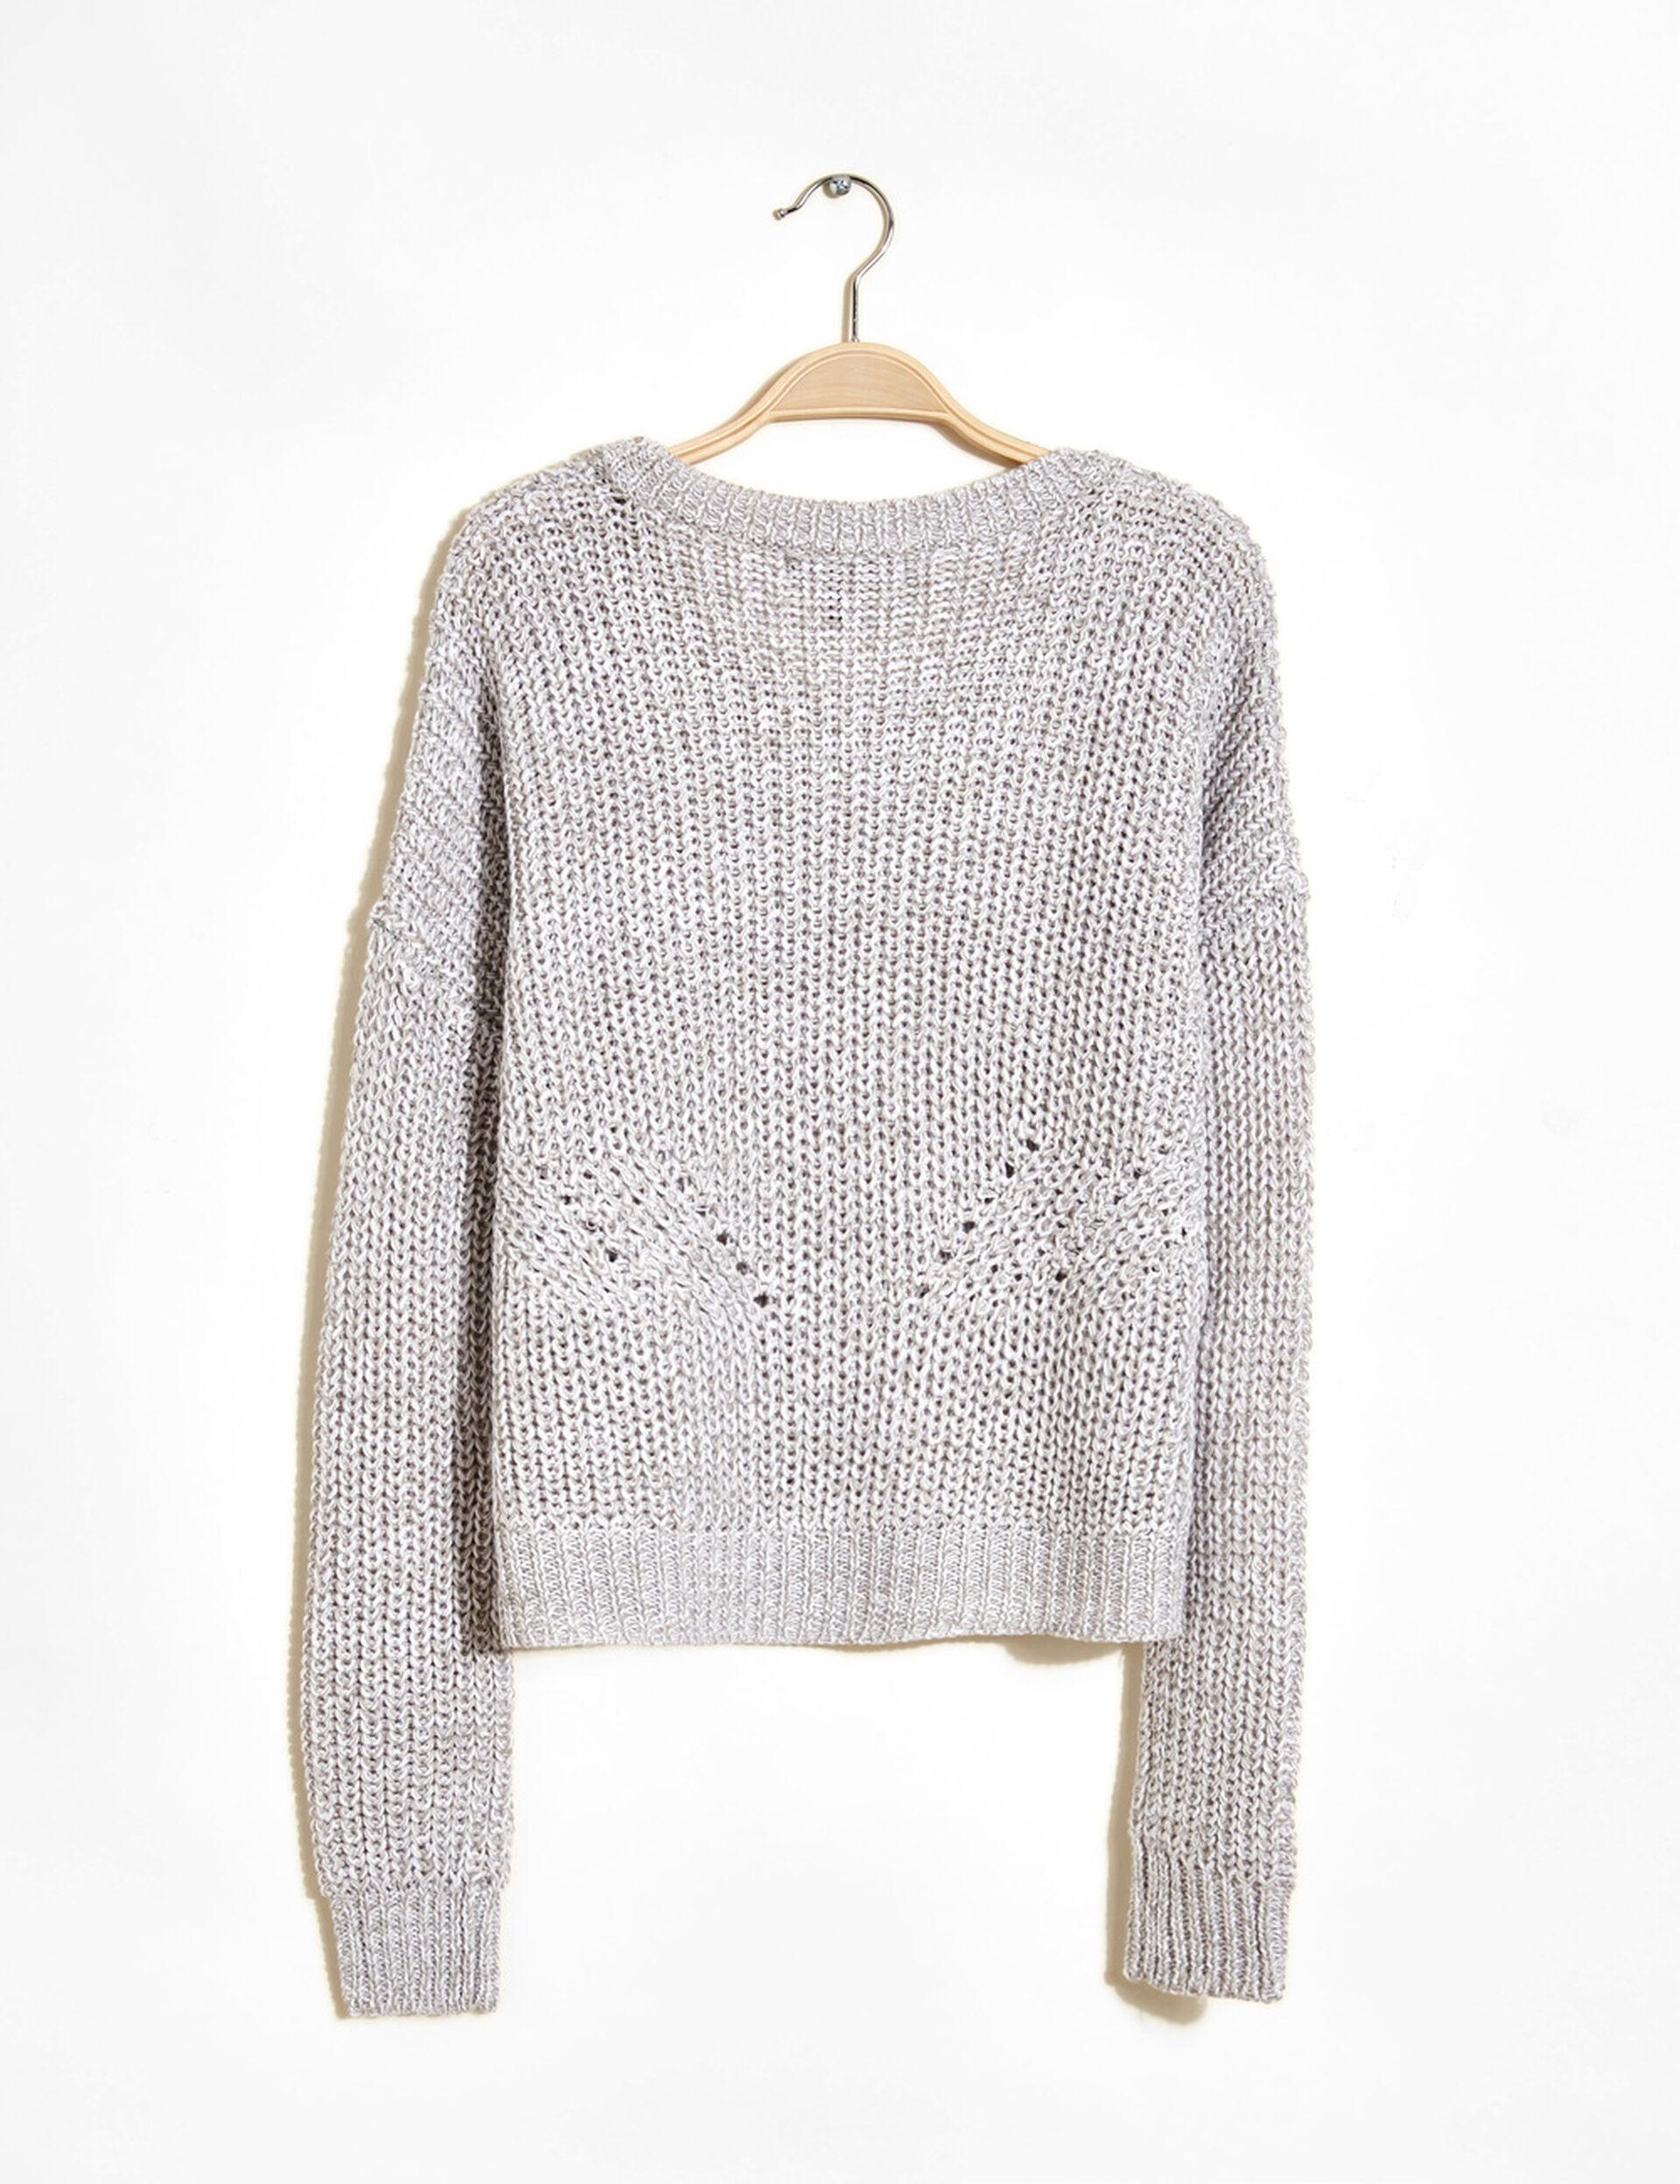 pull coupe courte maille gris chiné et blanc